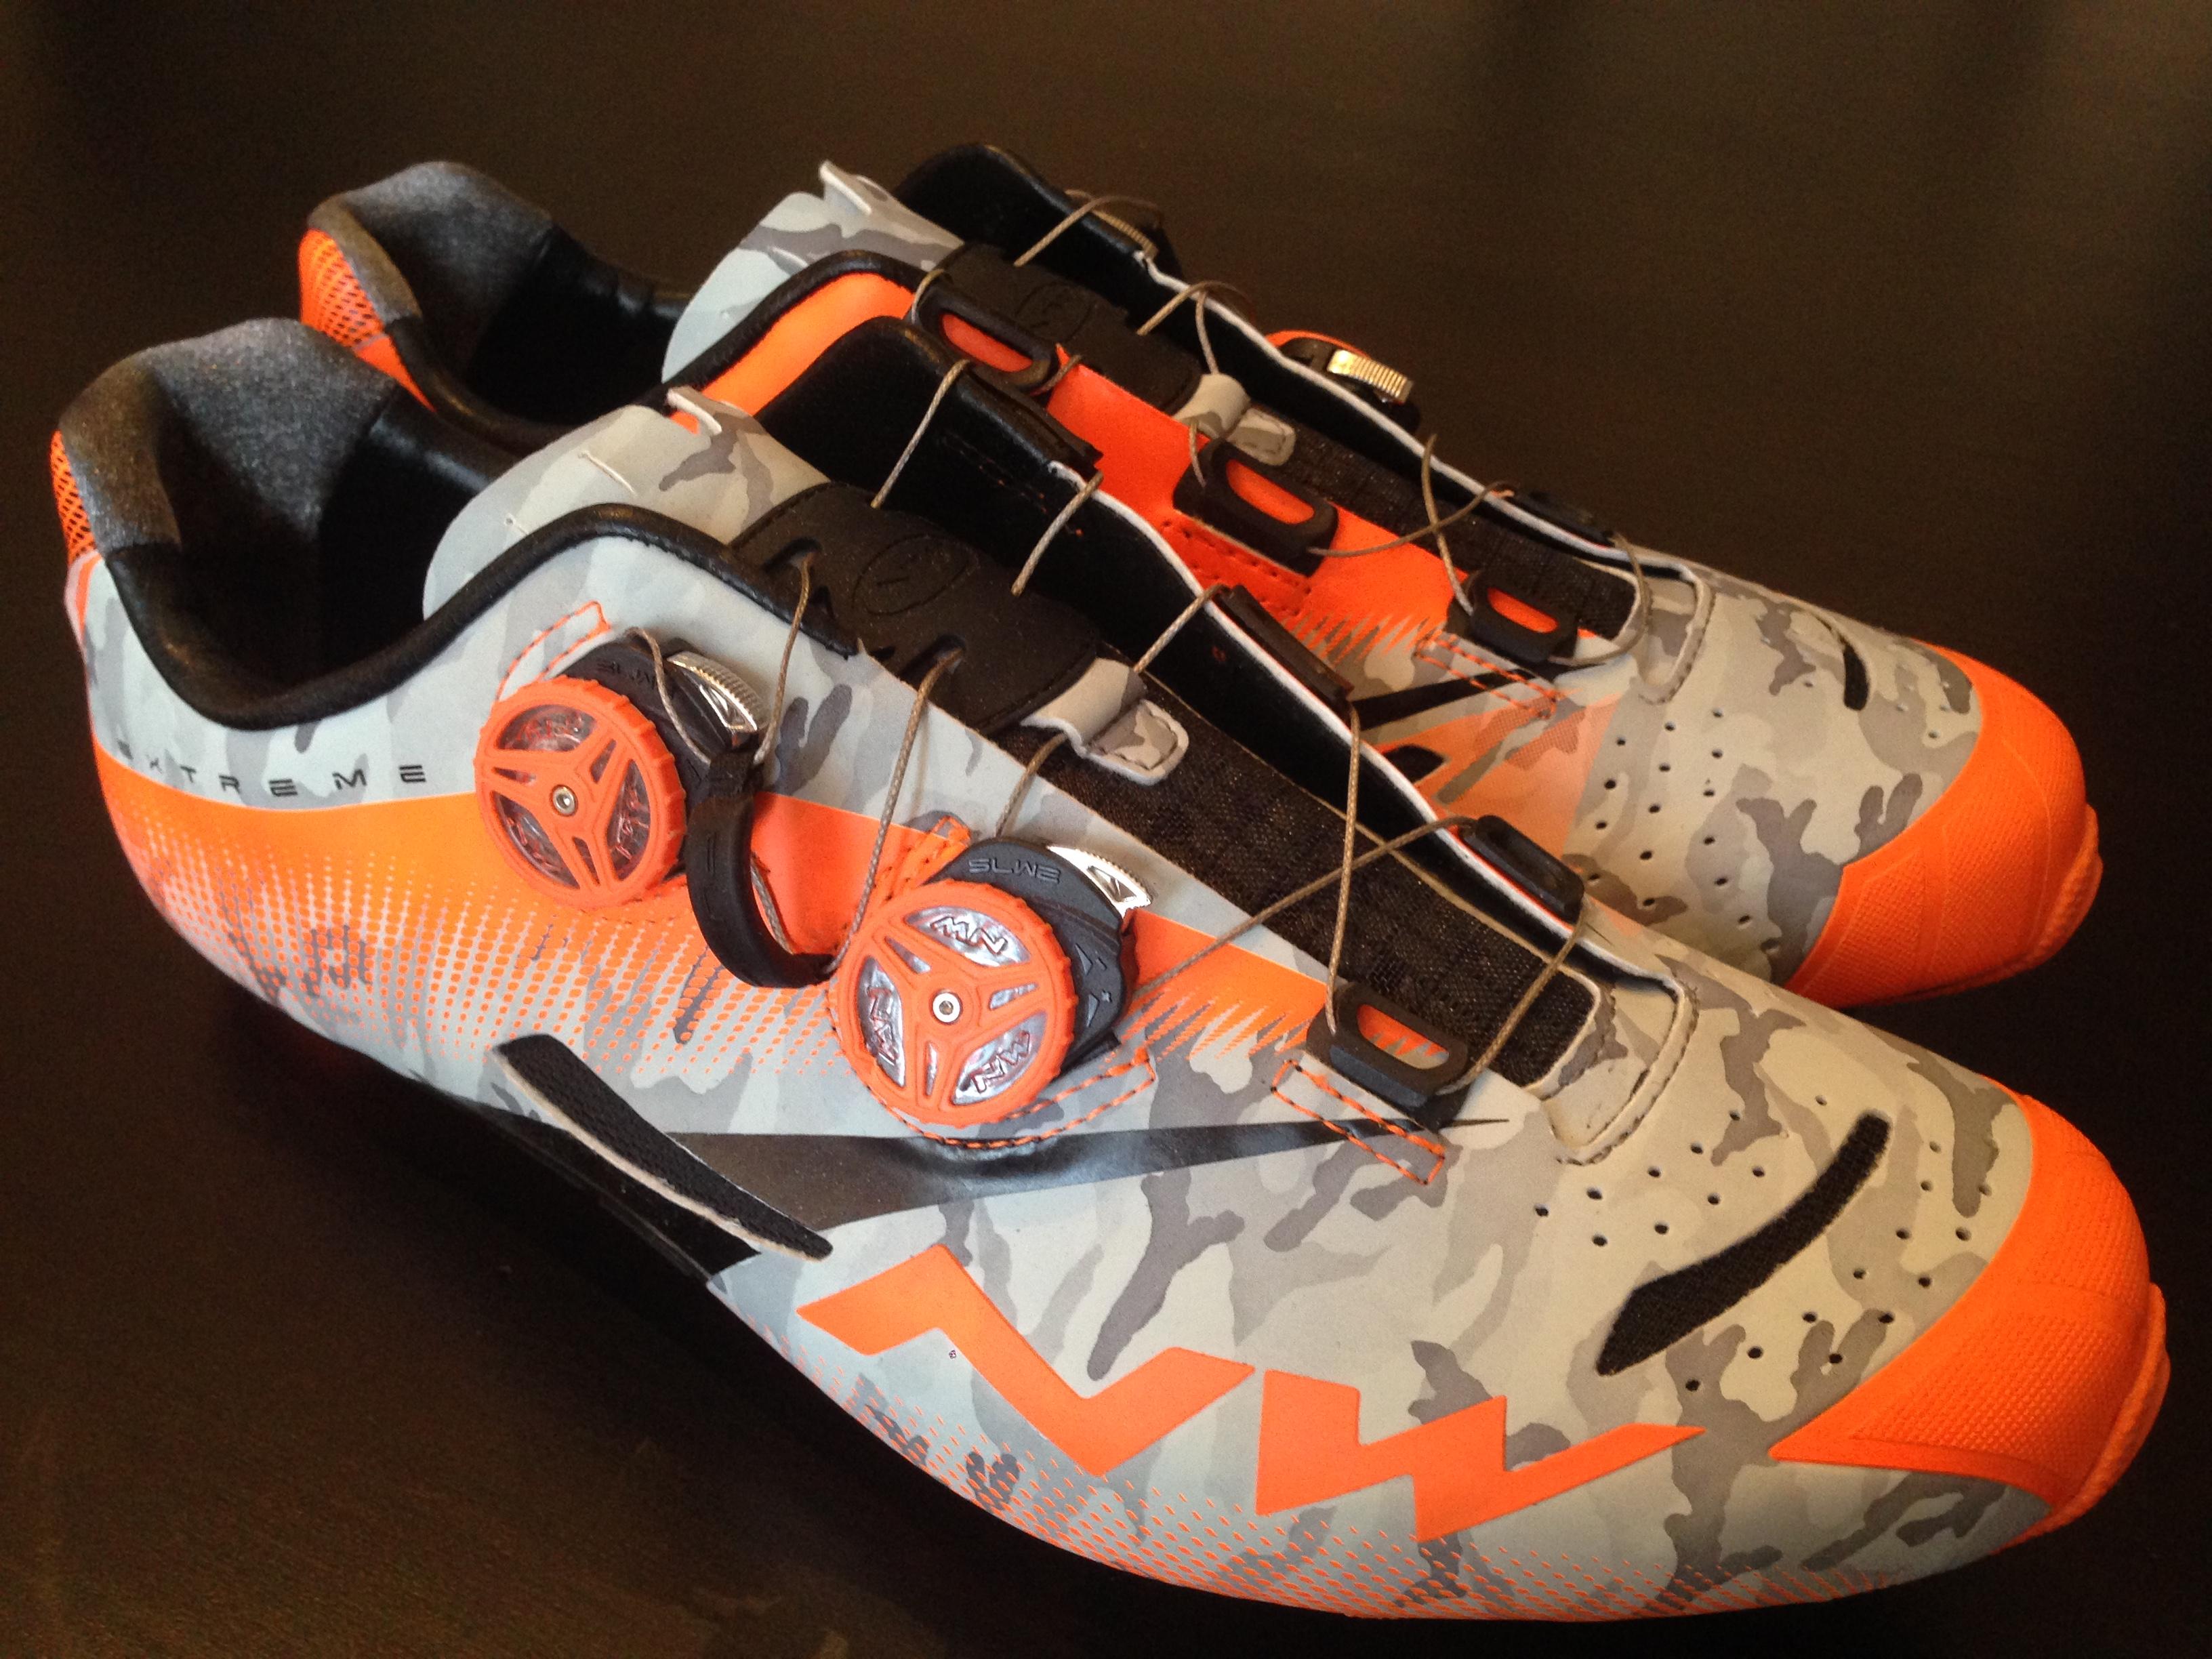 Northwave Extreme Tech Mtb Plus Shoe Review